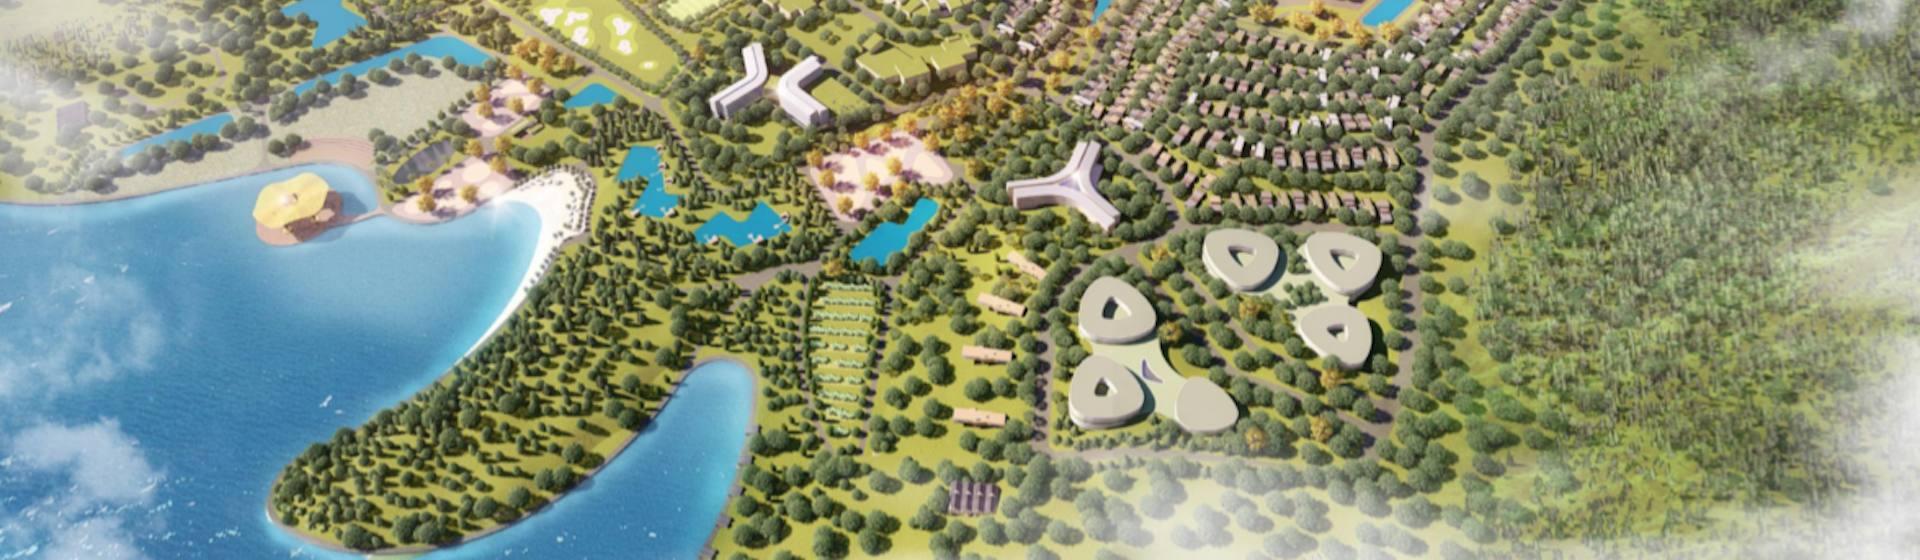 Nef  Nef City 82 Konut Projesi arkaplan